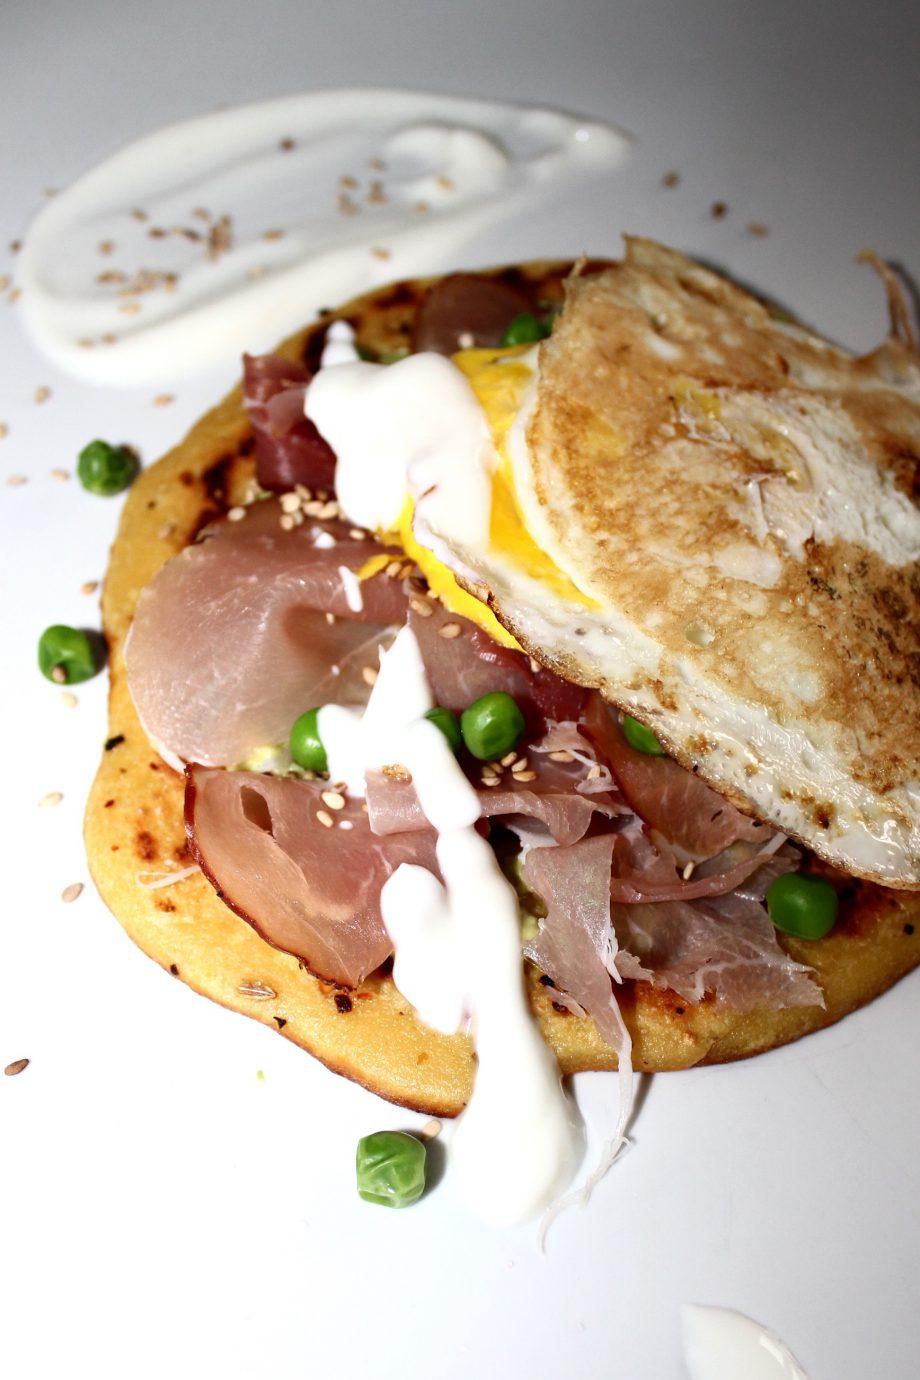 orientalische Kichererbsen-Pancakes |14.01.2017